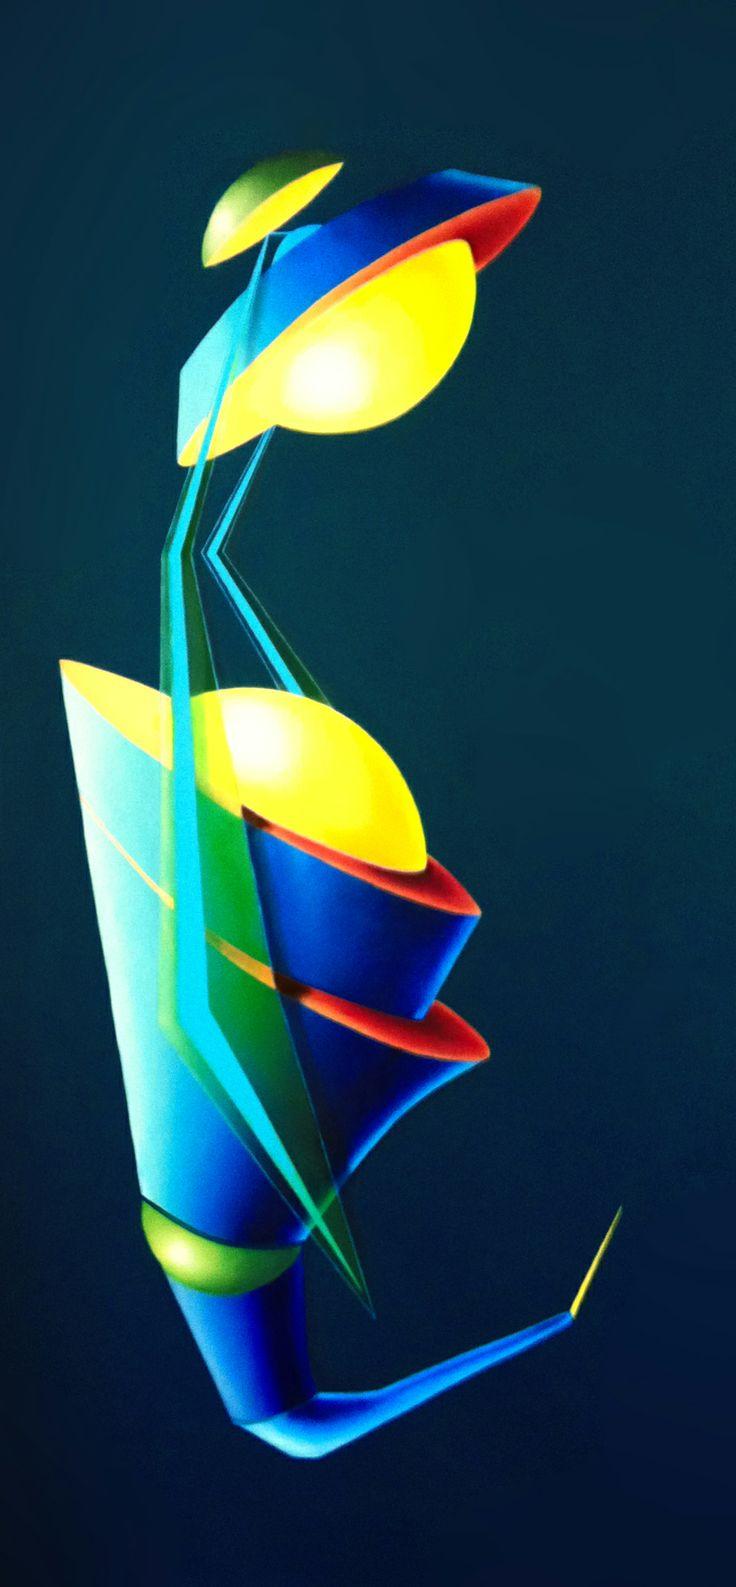 Sting, 2011, olio e acrilico su tela, 130x60 cm - Ignazio Mazzeo #art #painting #ignaziomazzeo #colours #nature